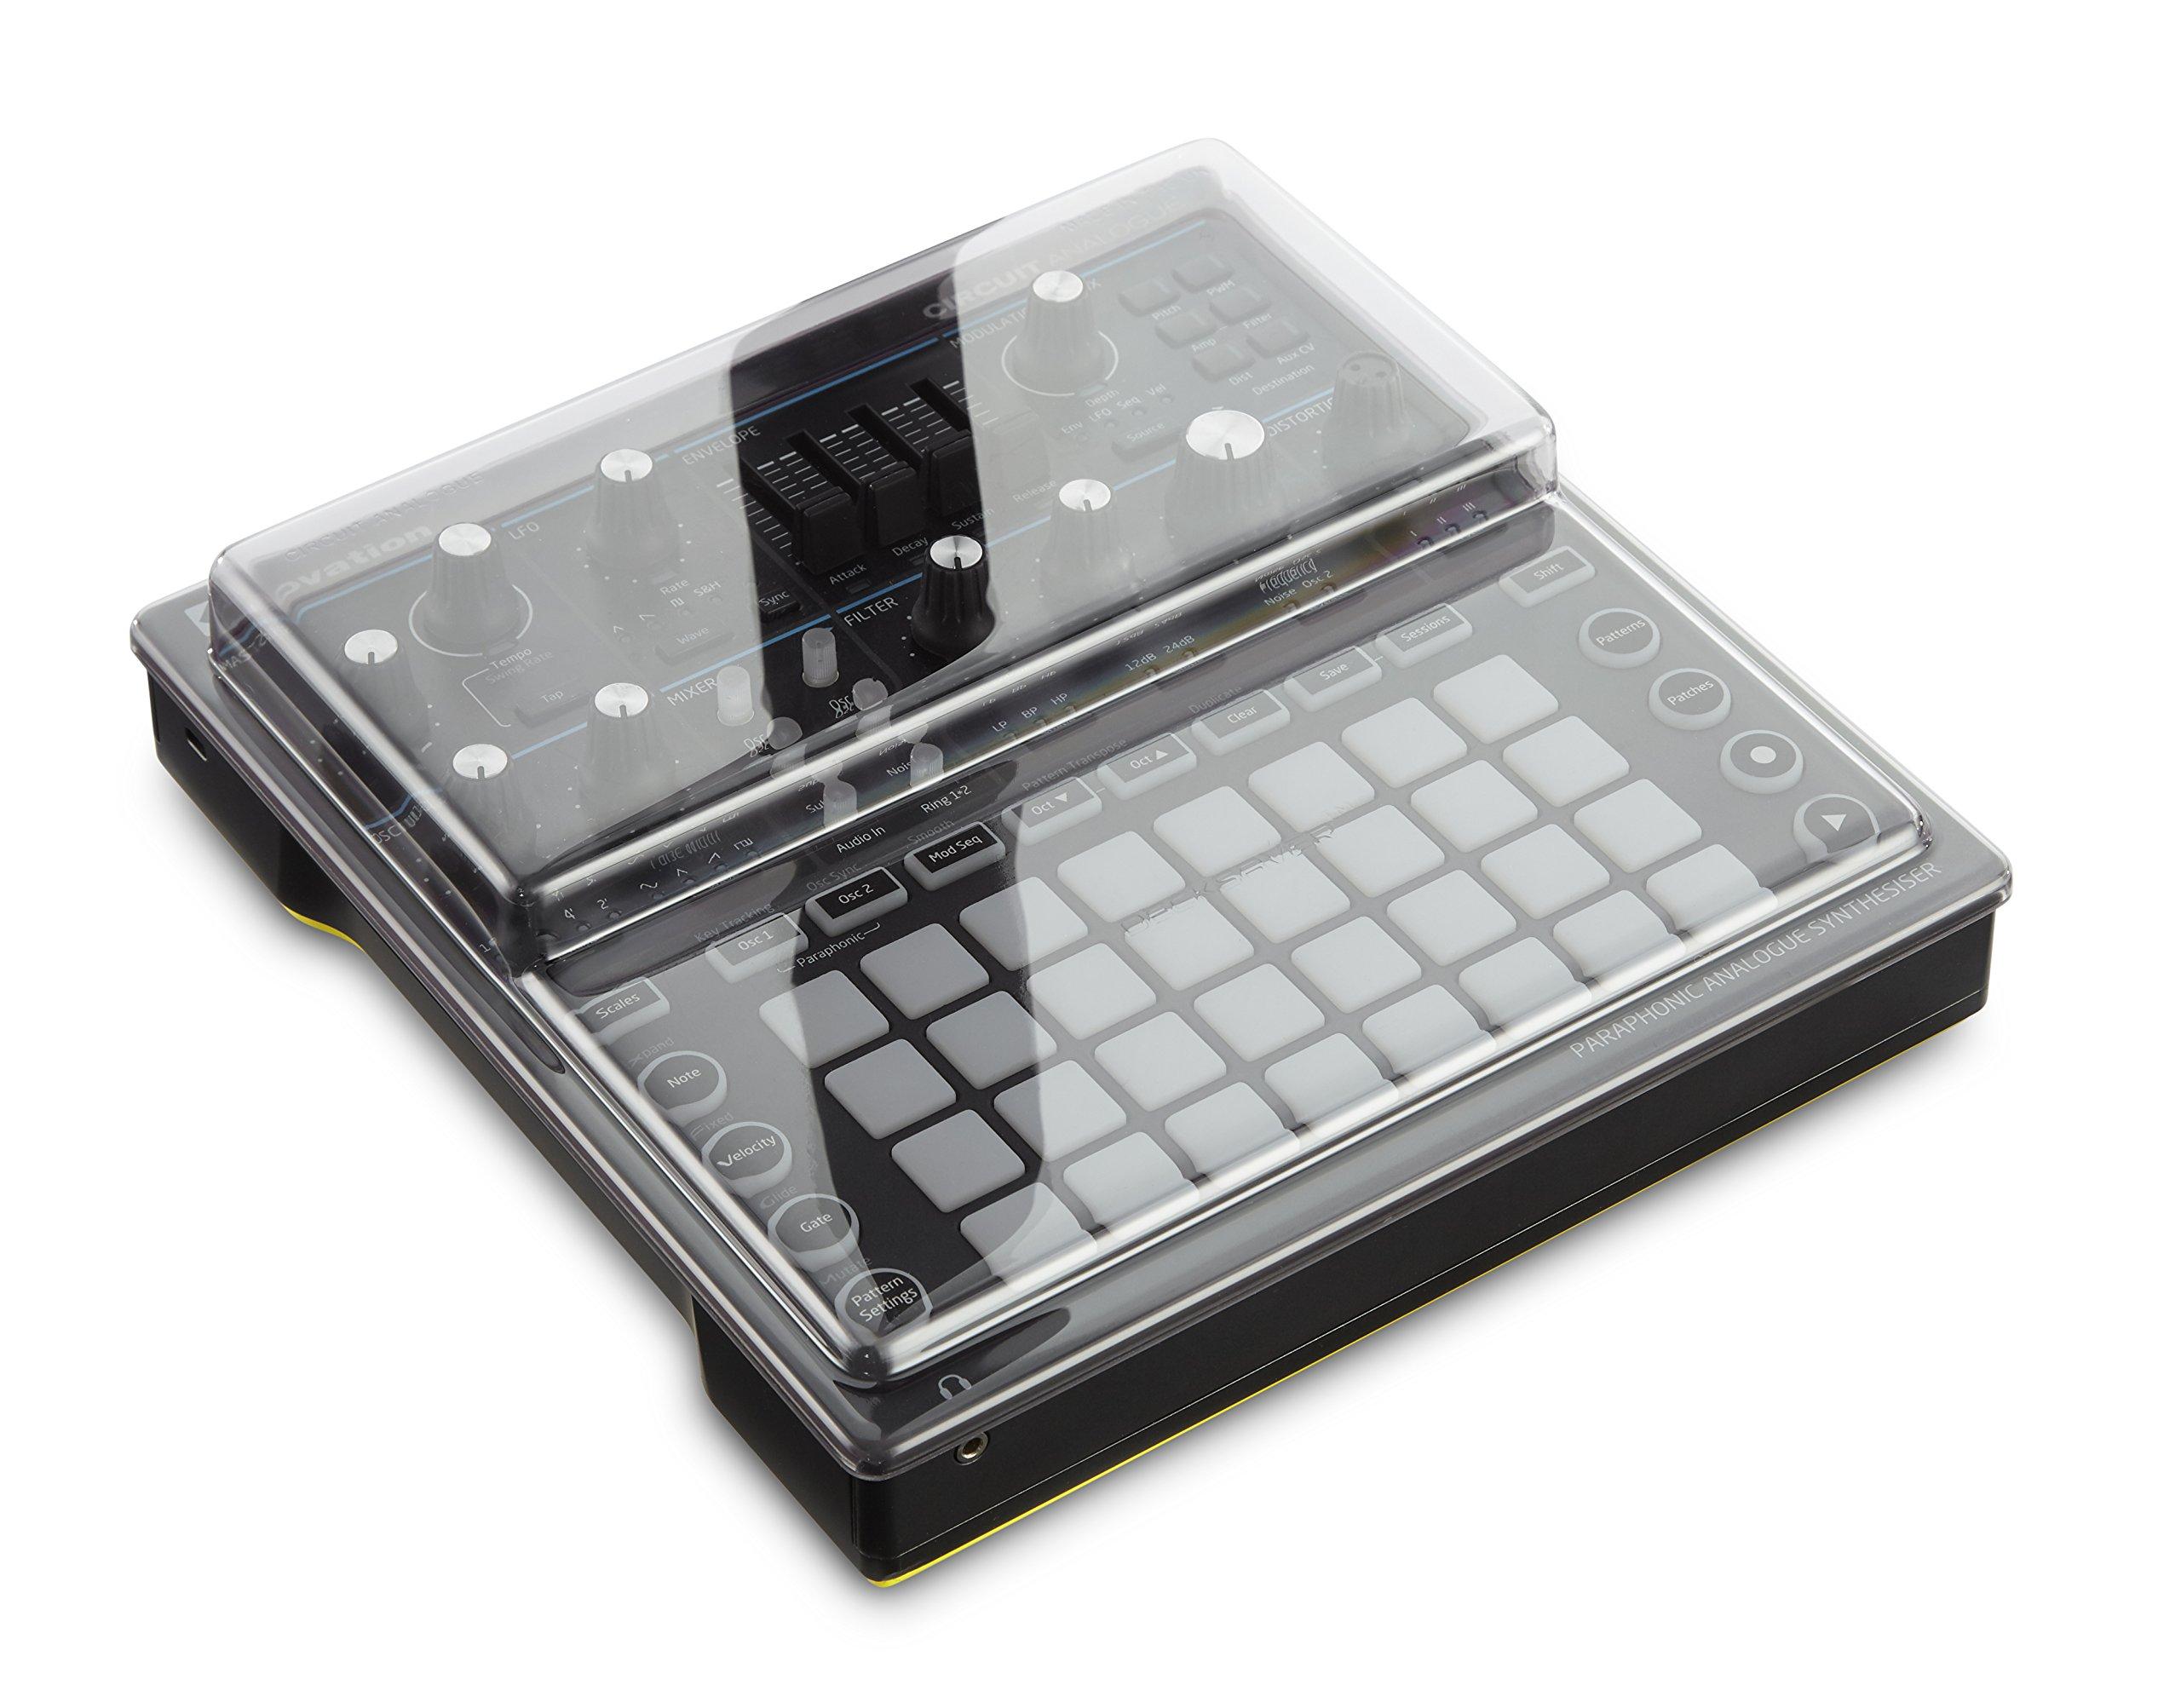 Decksaver DS-PC-CIRCUITMONO Polycarbonate Cover for the Novation Circuit Mono Station Analog Synthesizer